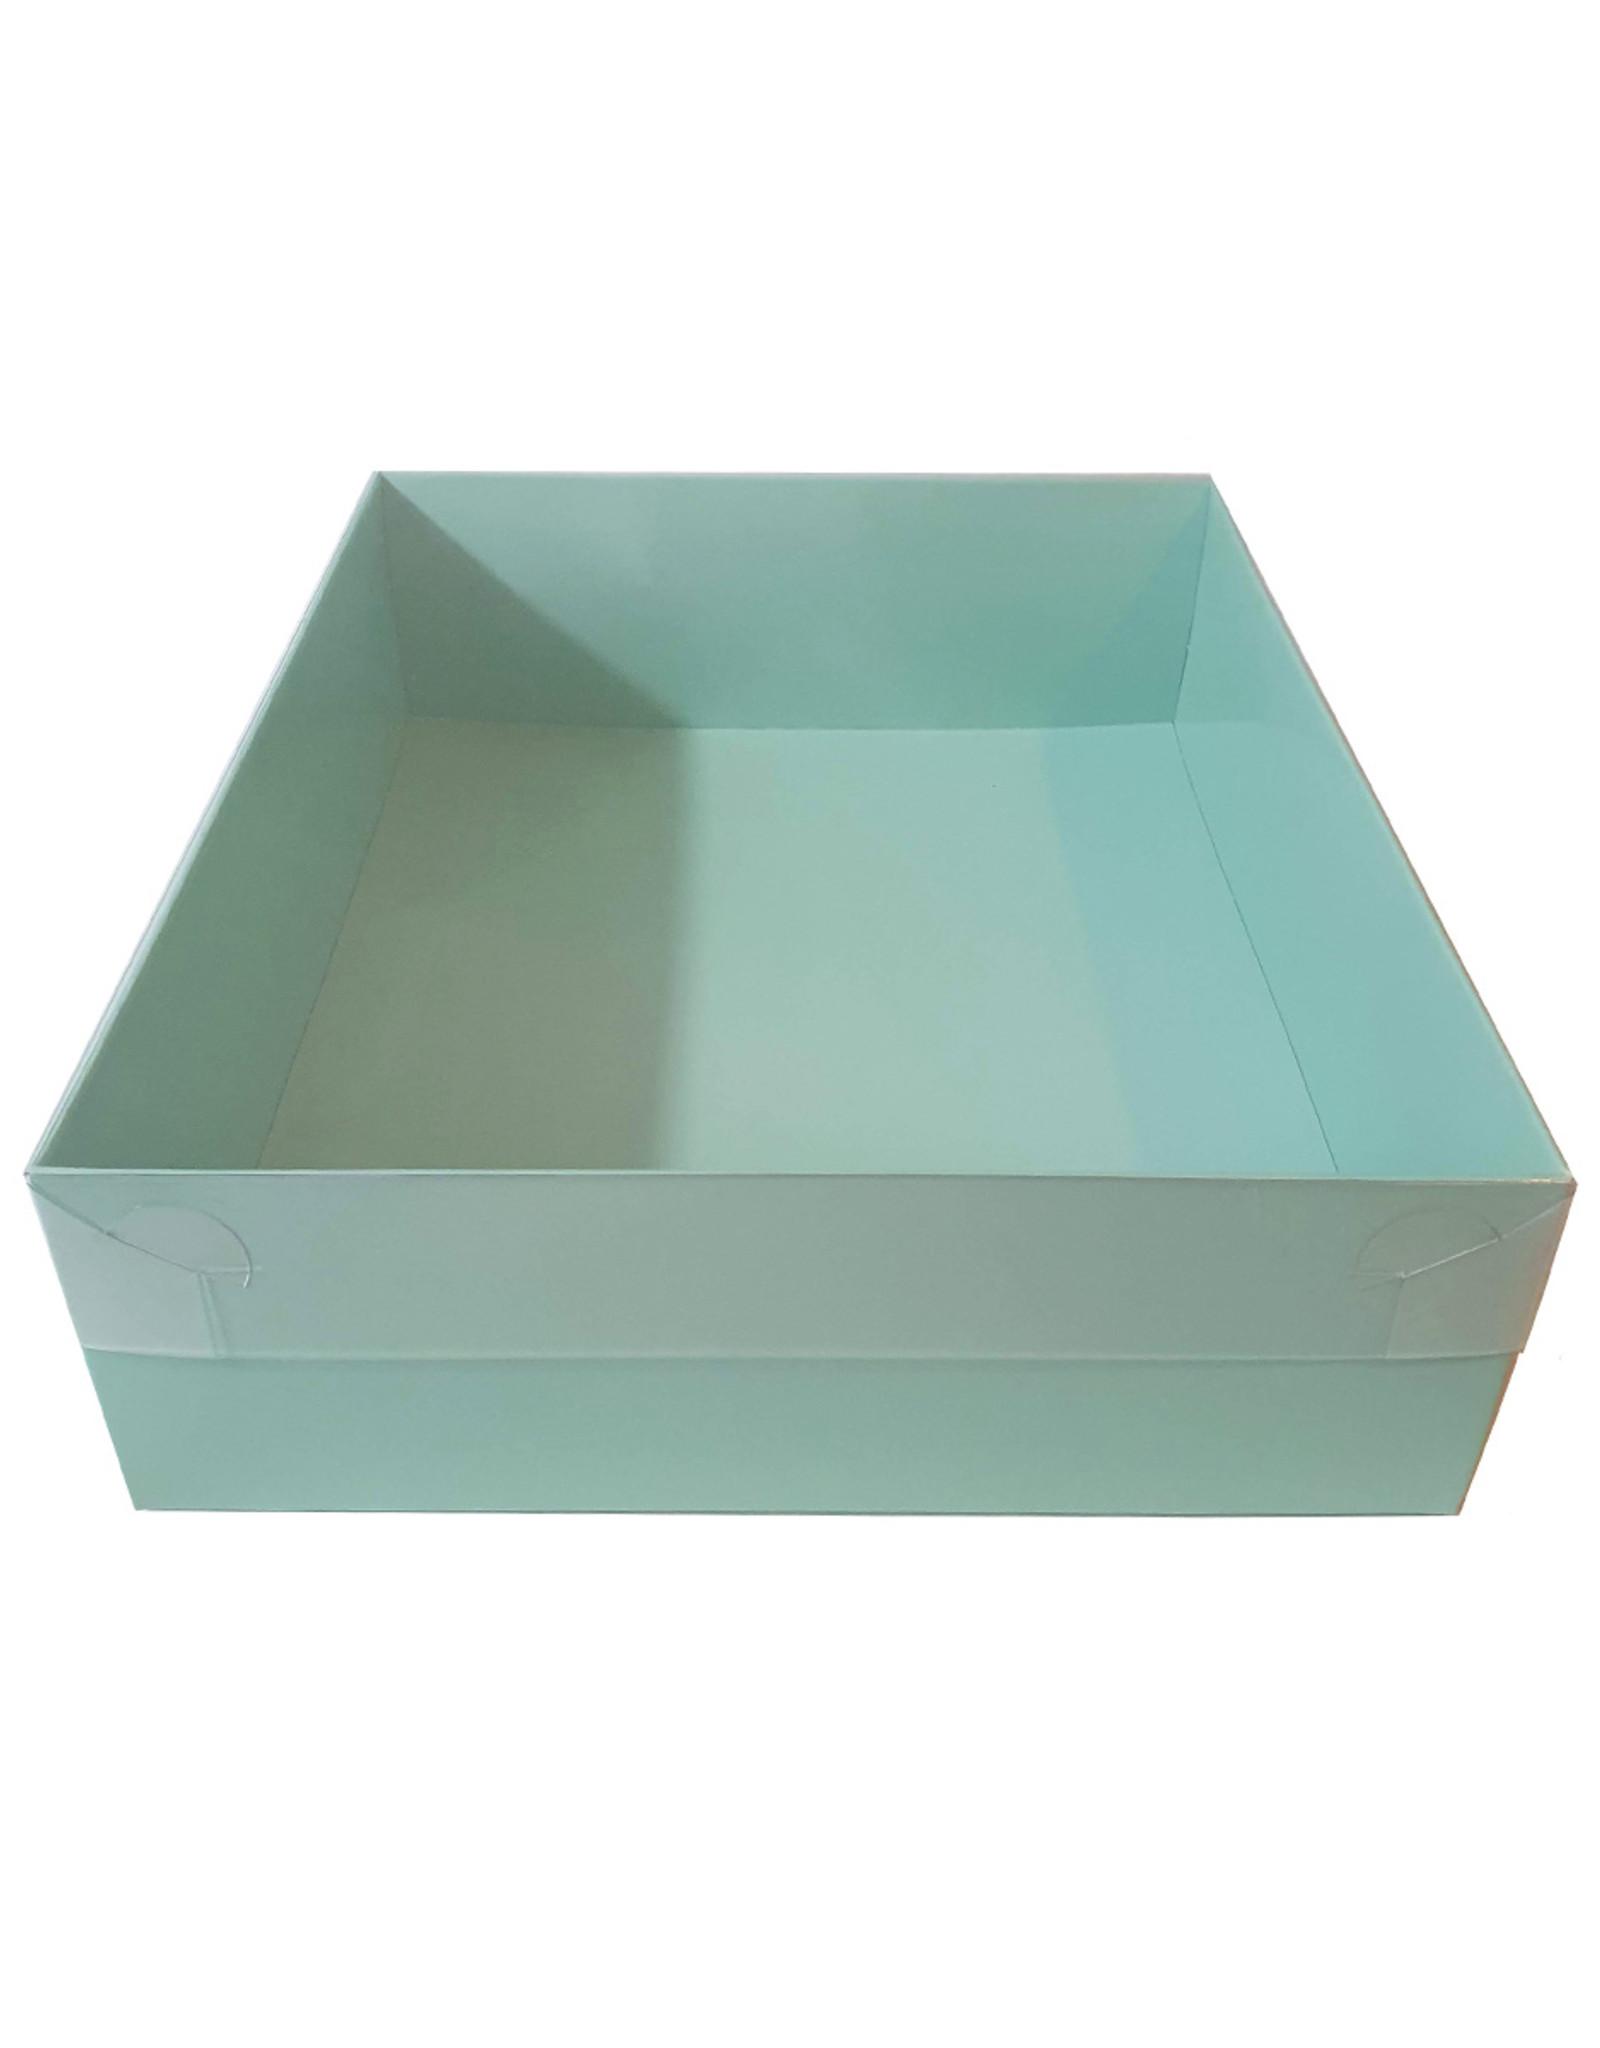 Mint sweetsbox met transparant deksel - 25 x 20 x 7 cm (per 50 stuks)